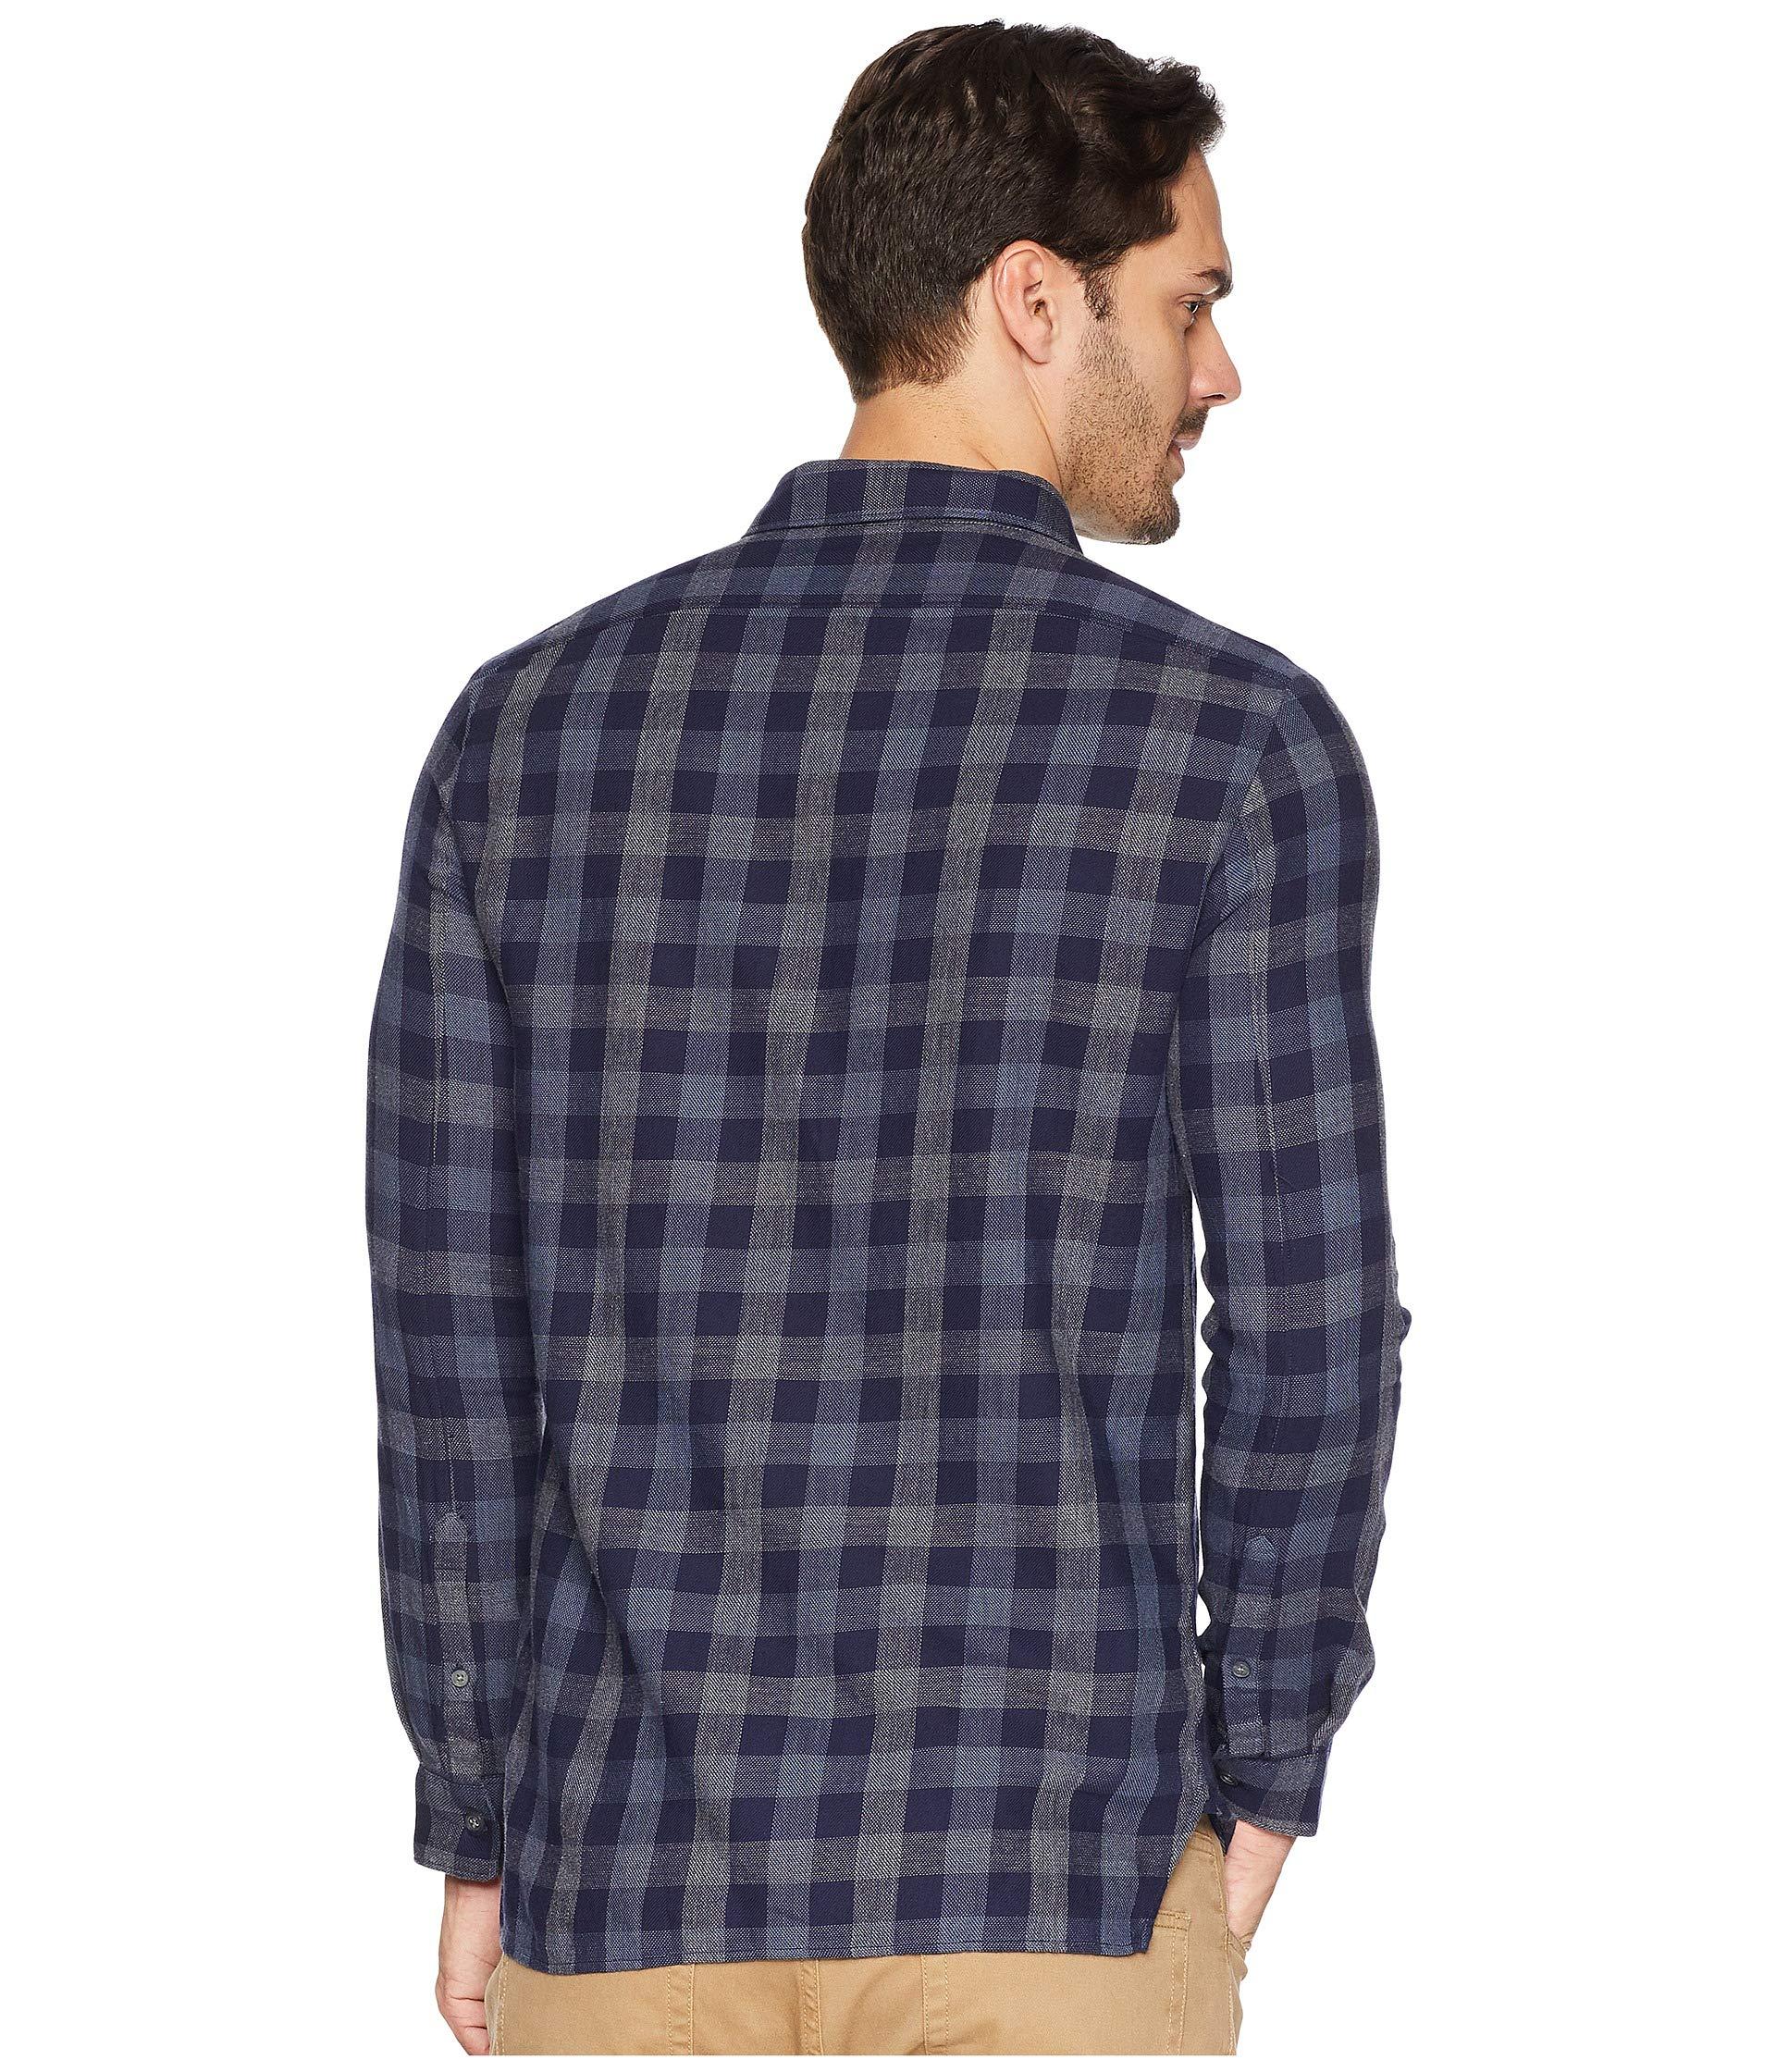 Shirt U Varvatos John s Sleeve Navy a Button Long Front Star EEzqpg